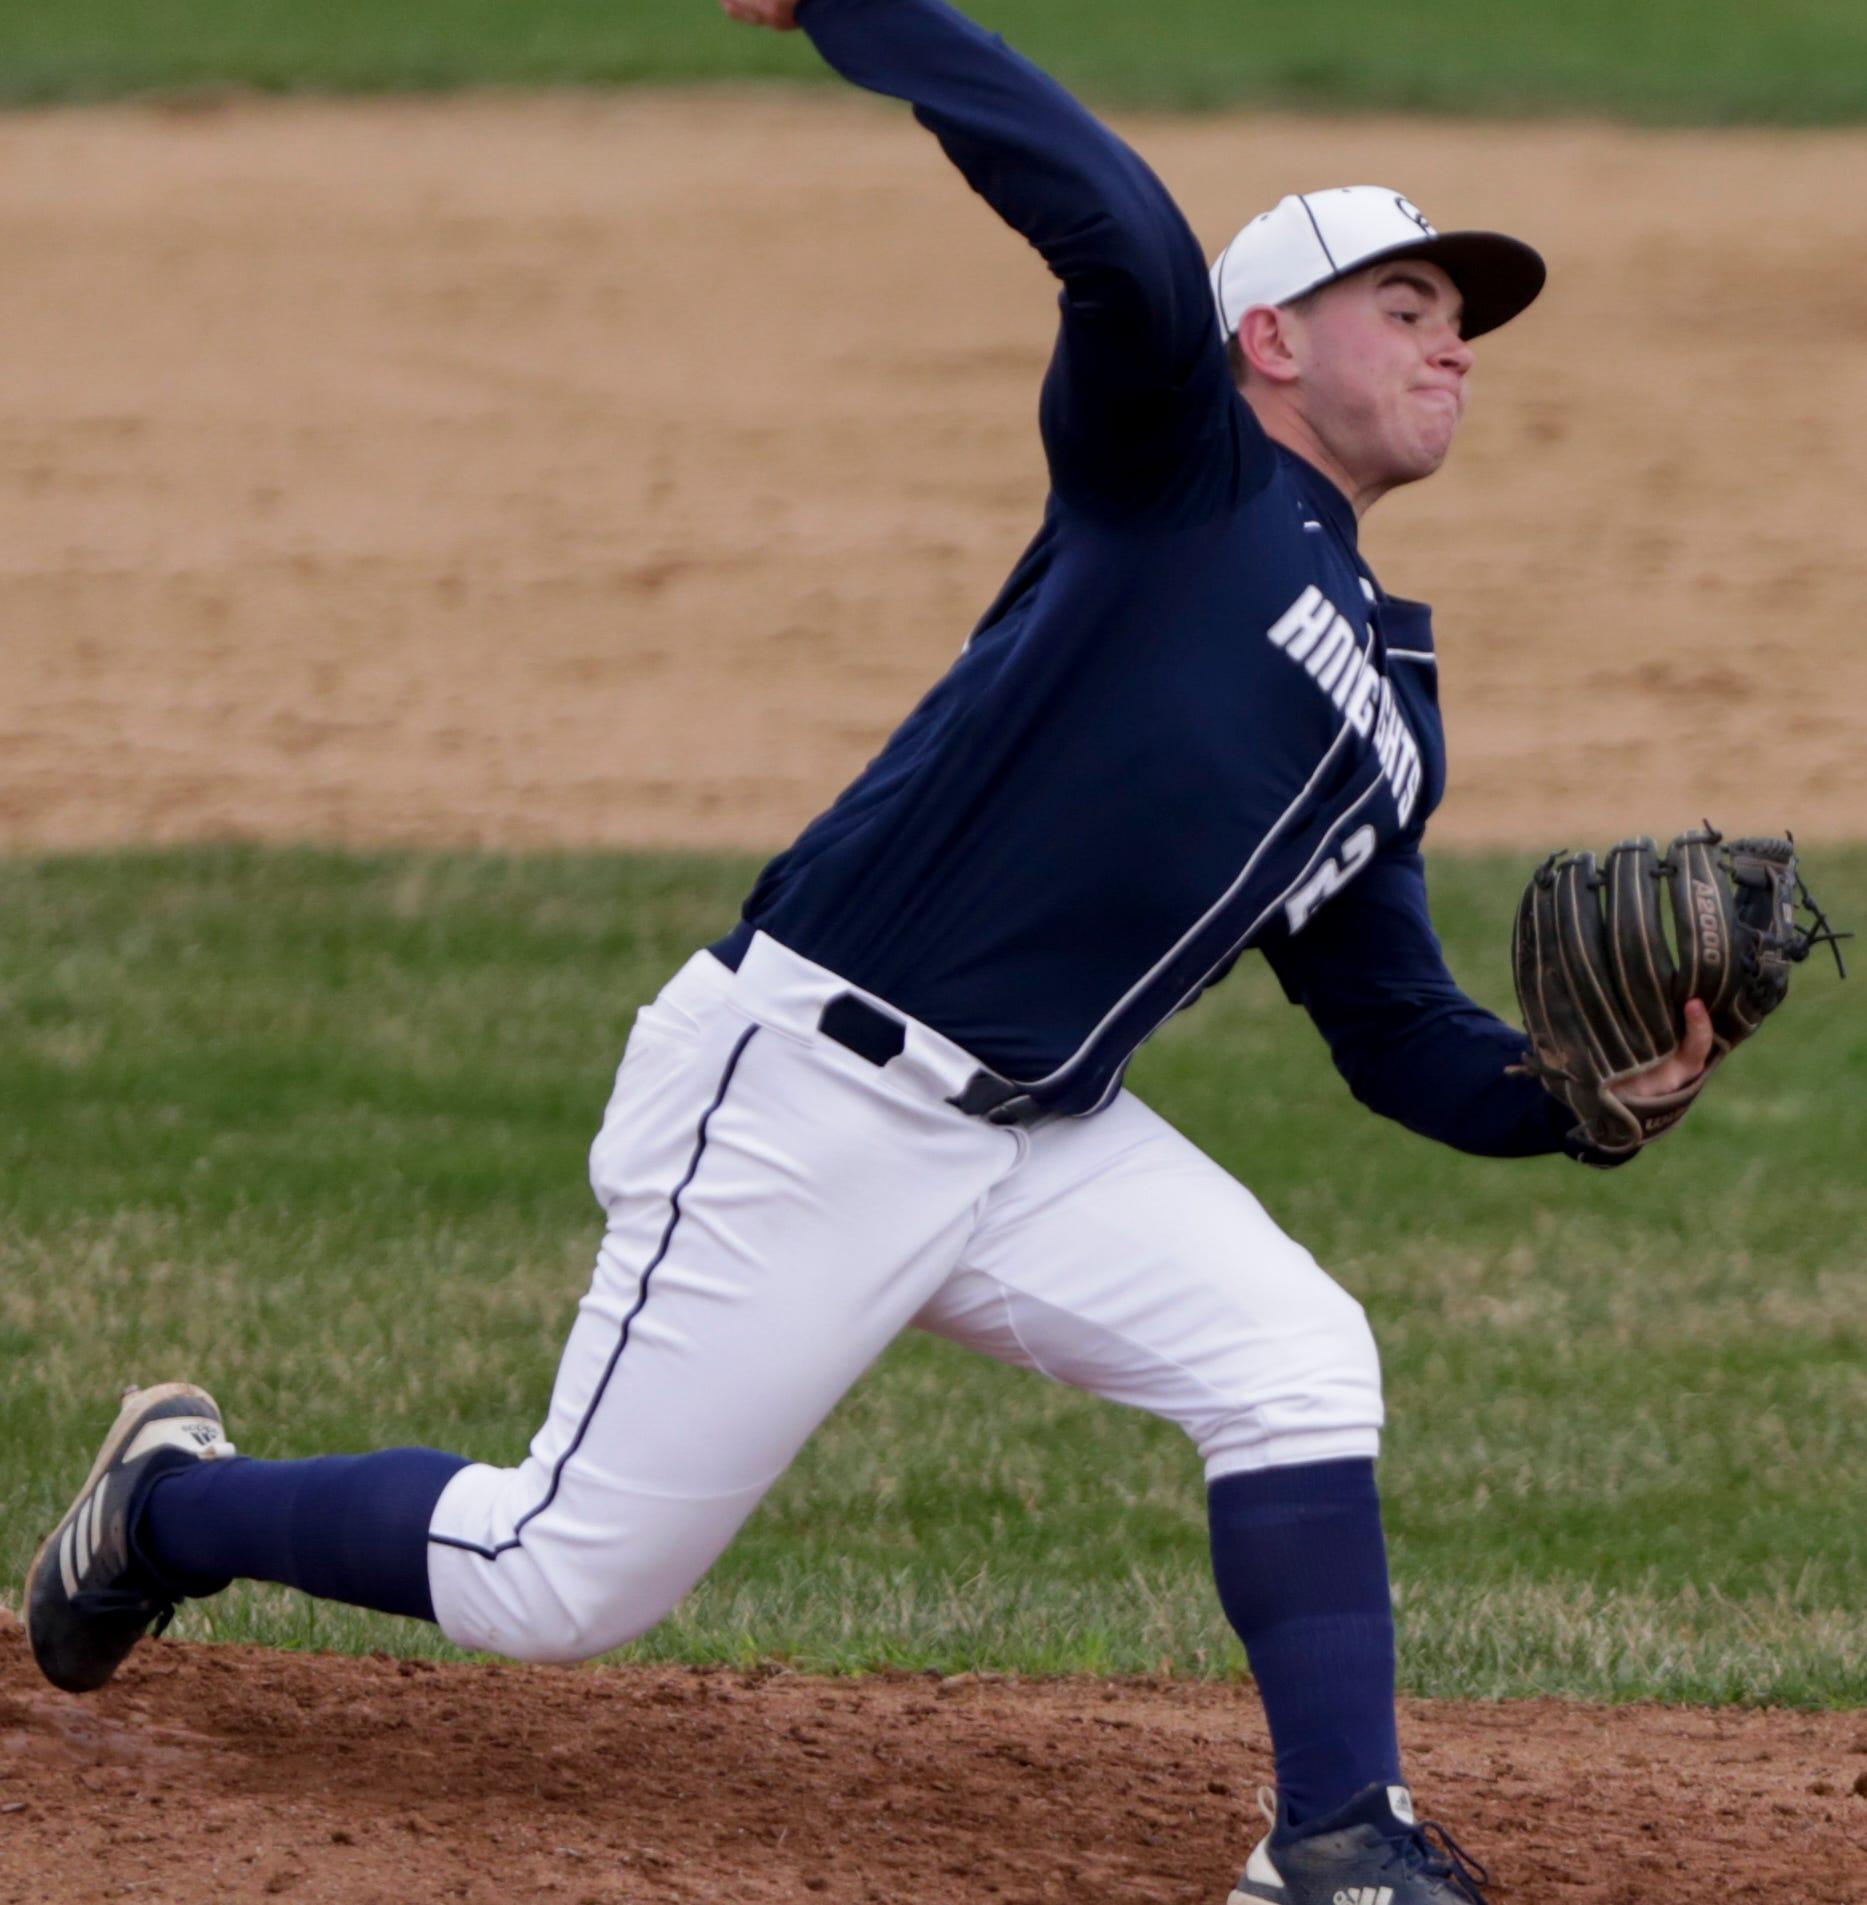 Central Catholic's Adam Dienhart embraces pitching under pressure